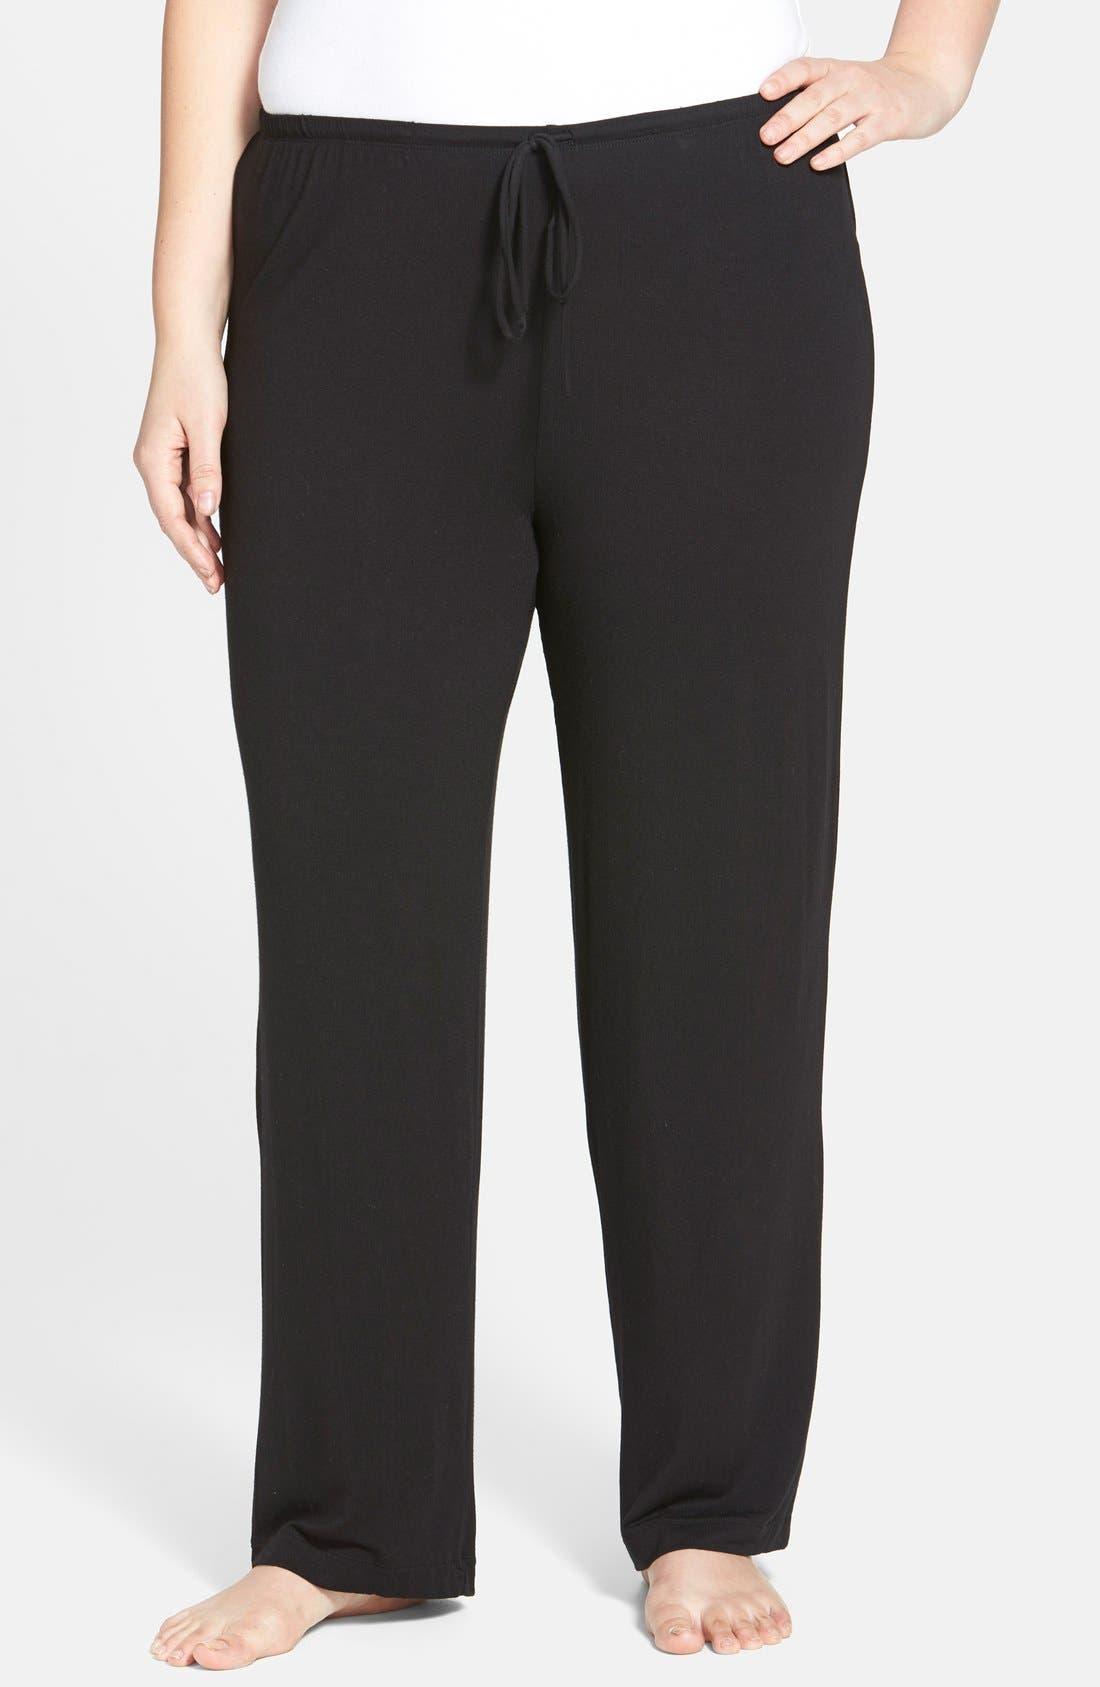 DKNY 'Urban Essentials' Pants (Plus Size)